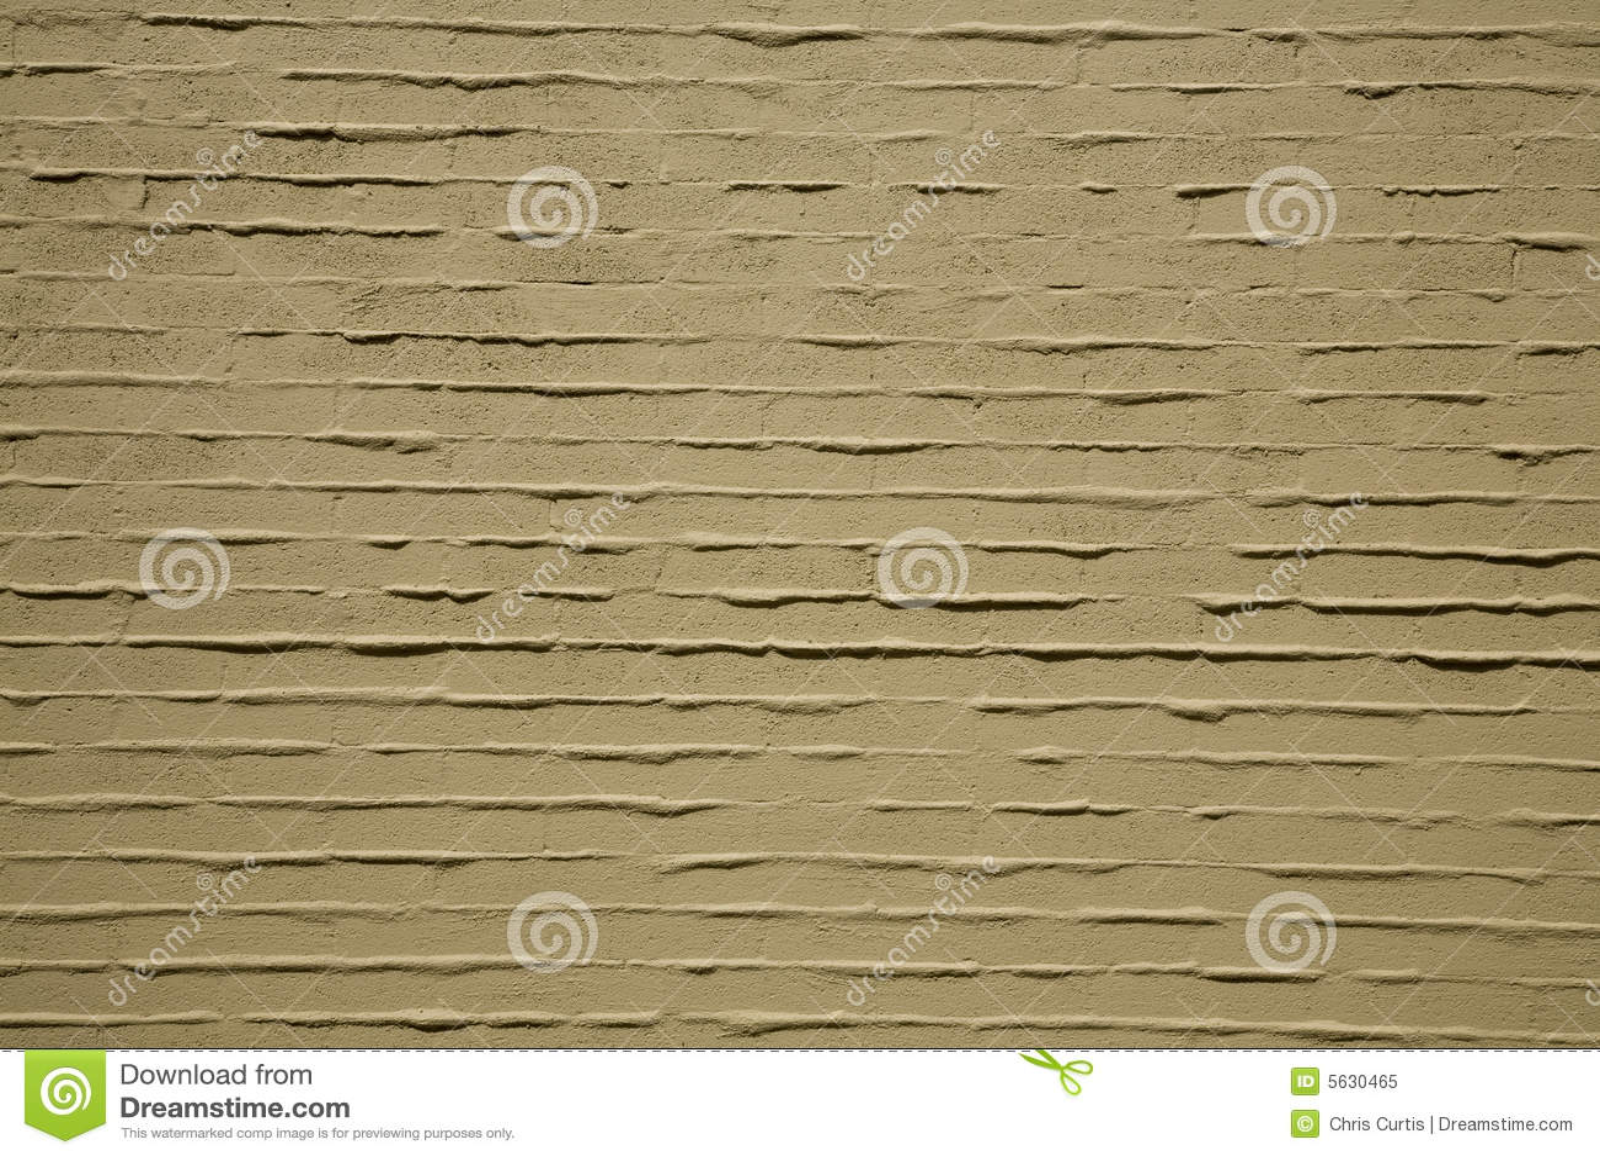 Unusal Brick Wall Background Texture Royalty Free Stock